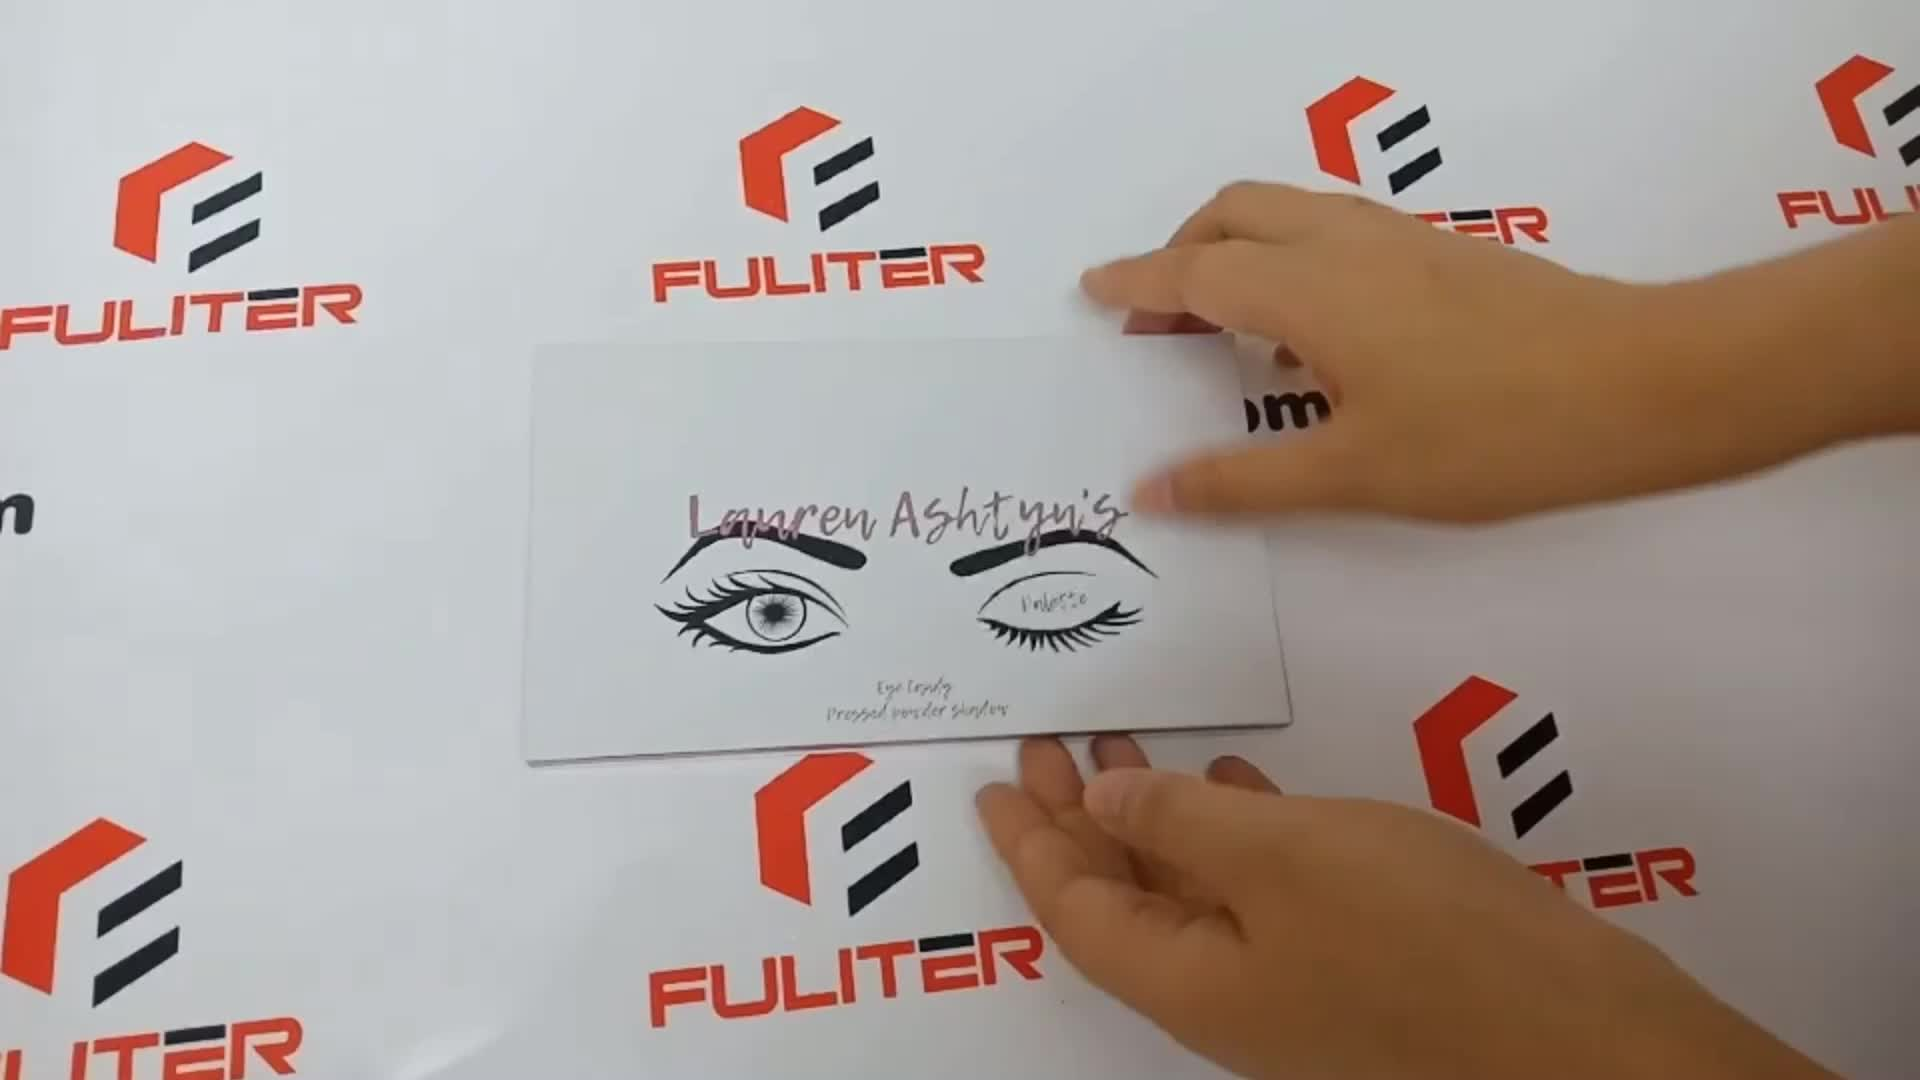 Toptancı Hediye Kutusu Baskı Karton Ambalaj Boş Göz Farı Durumda / Göz Farı Kutusu / Göz Farı Ambalajı